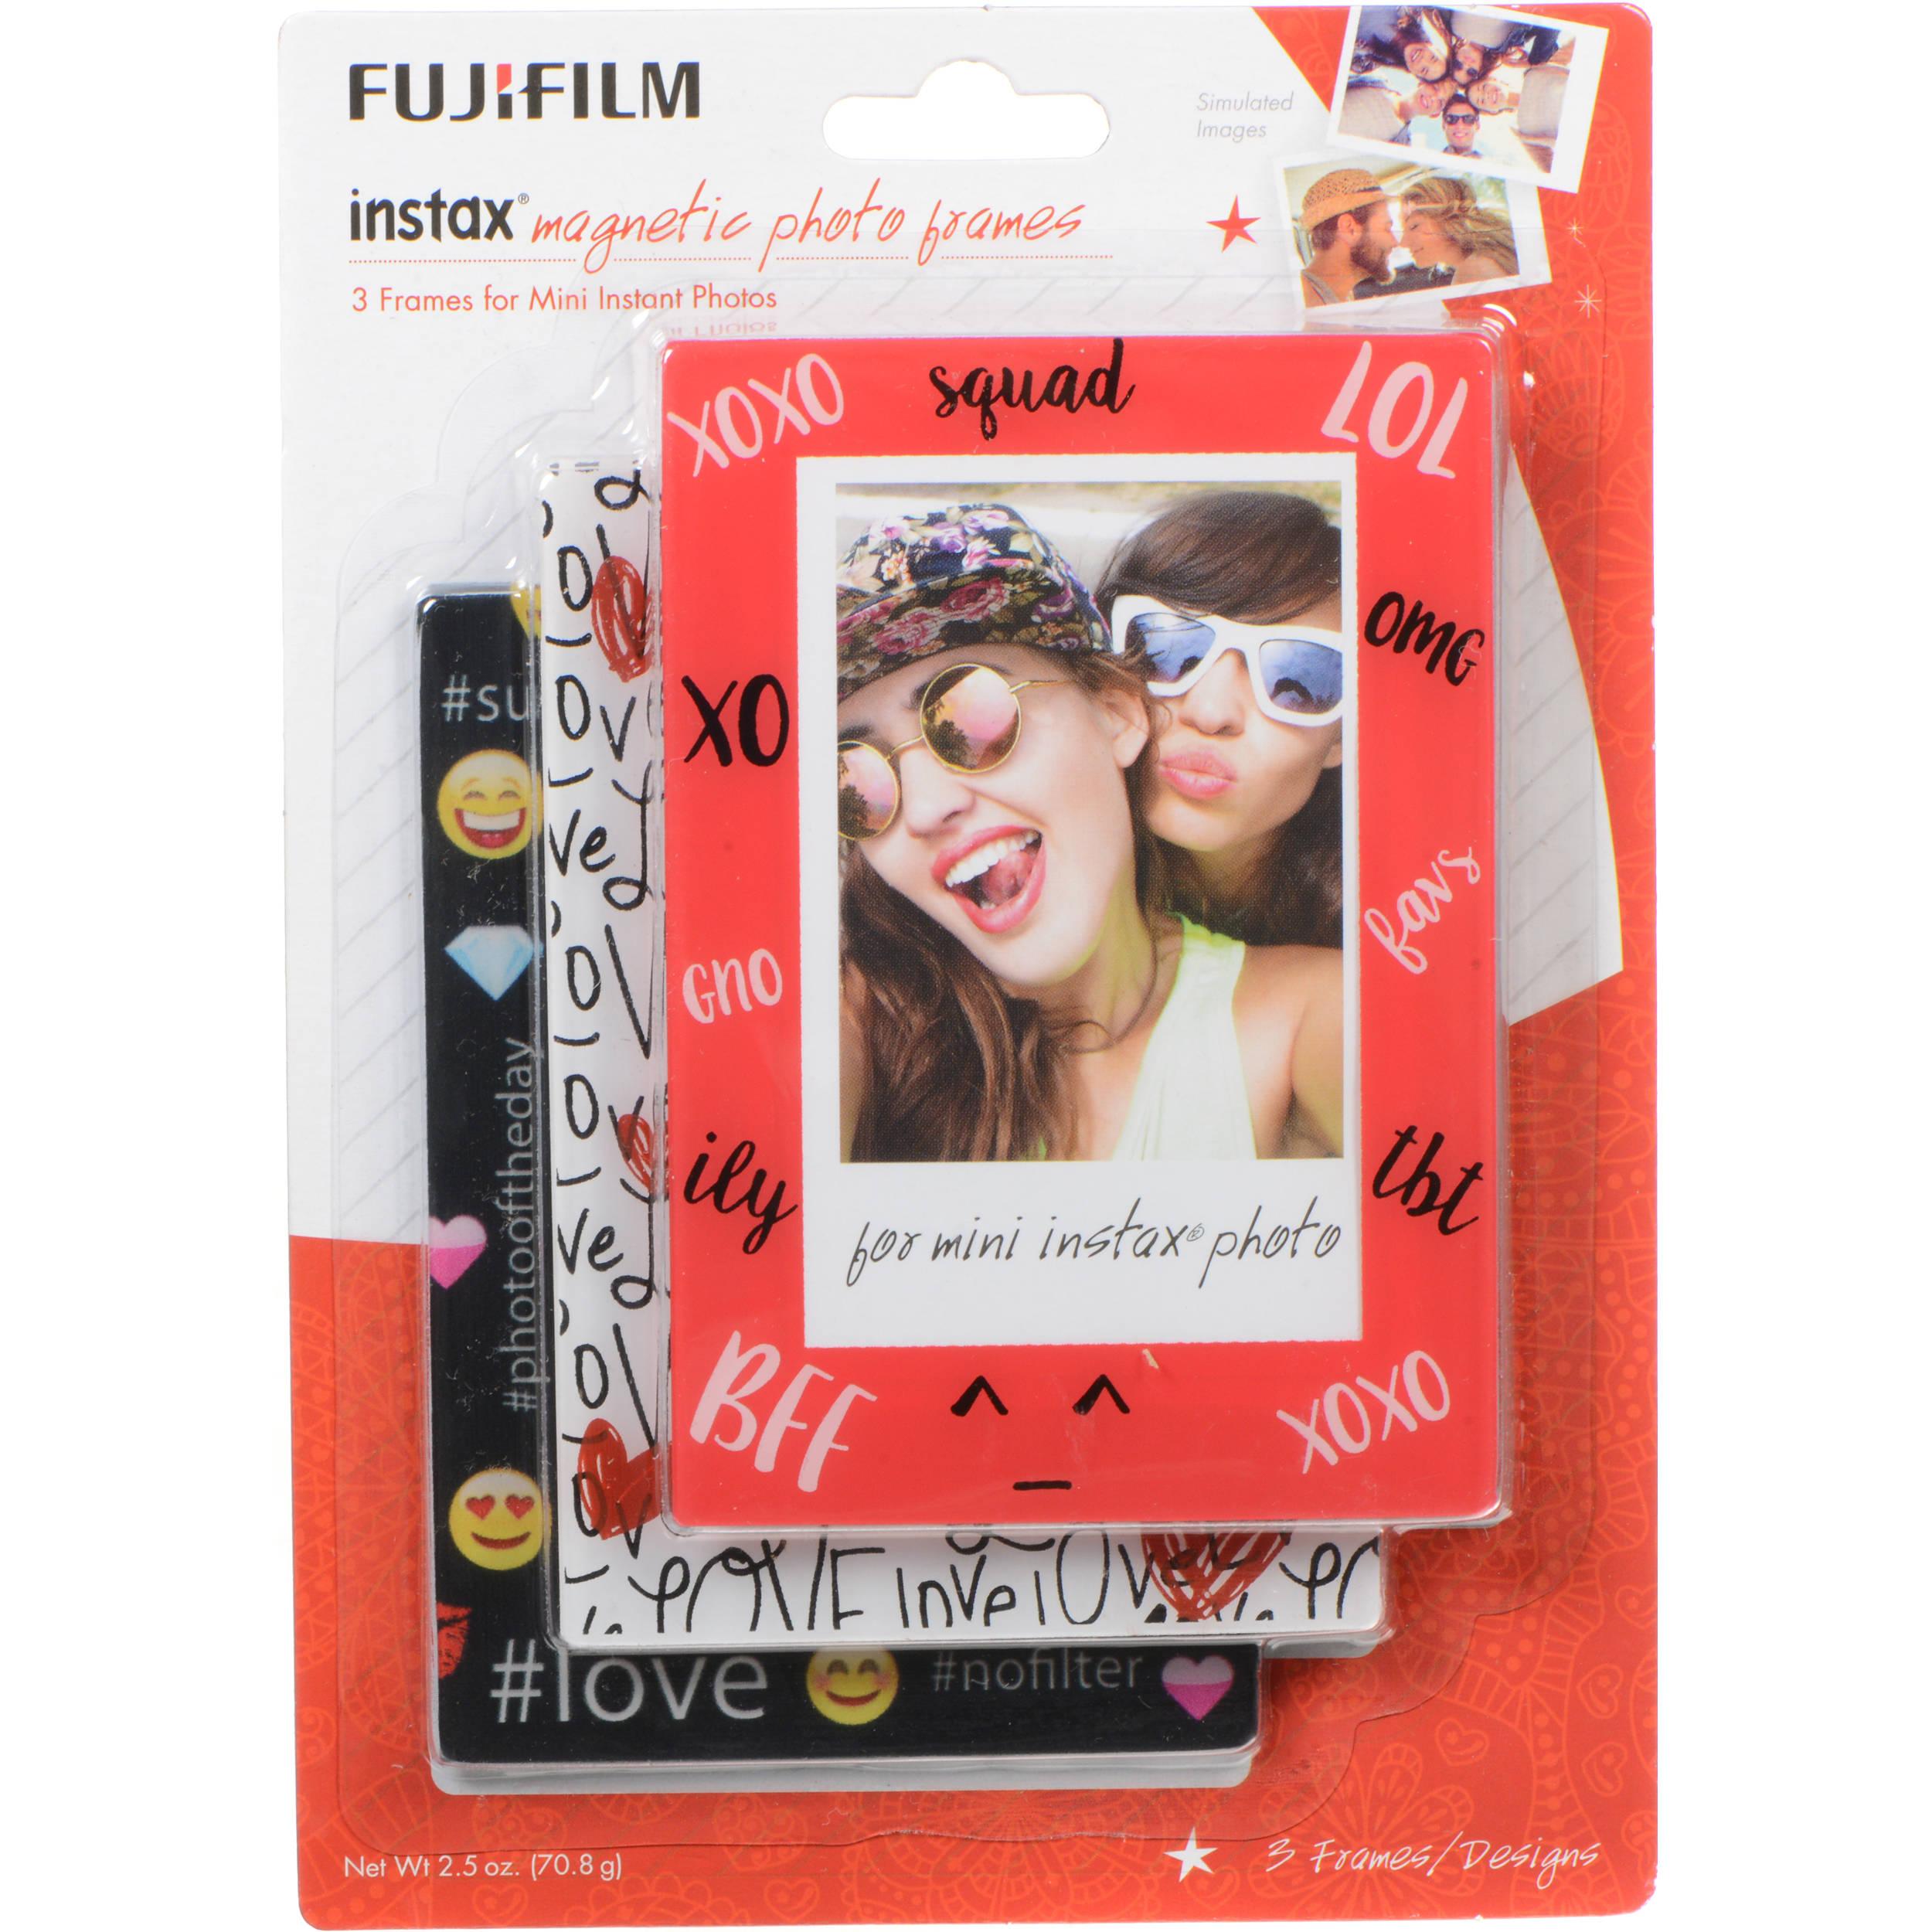 fujifilm instax 3pack magnetic frames emoji